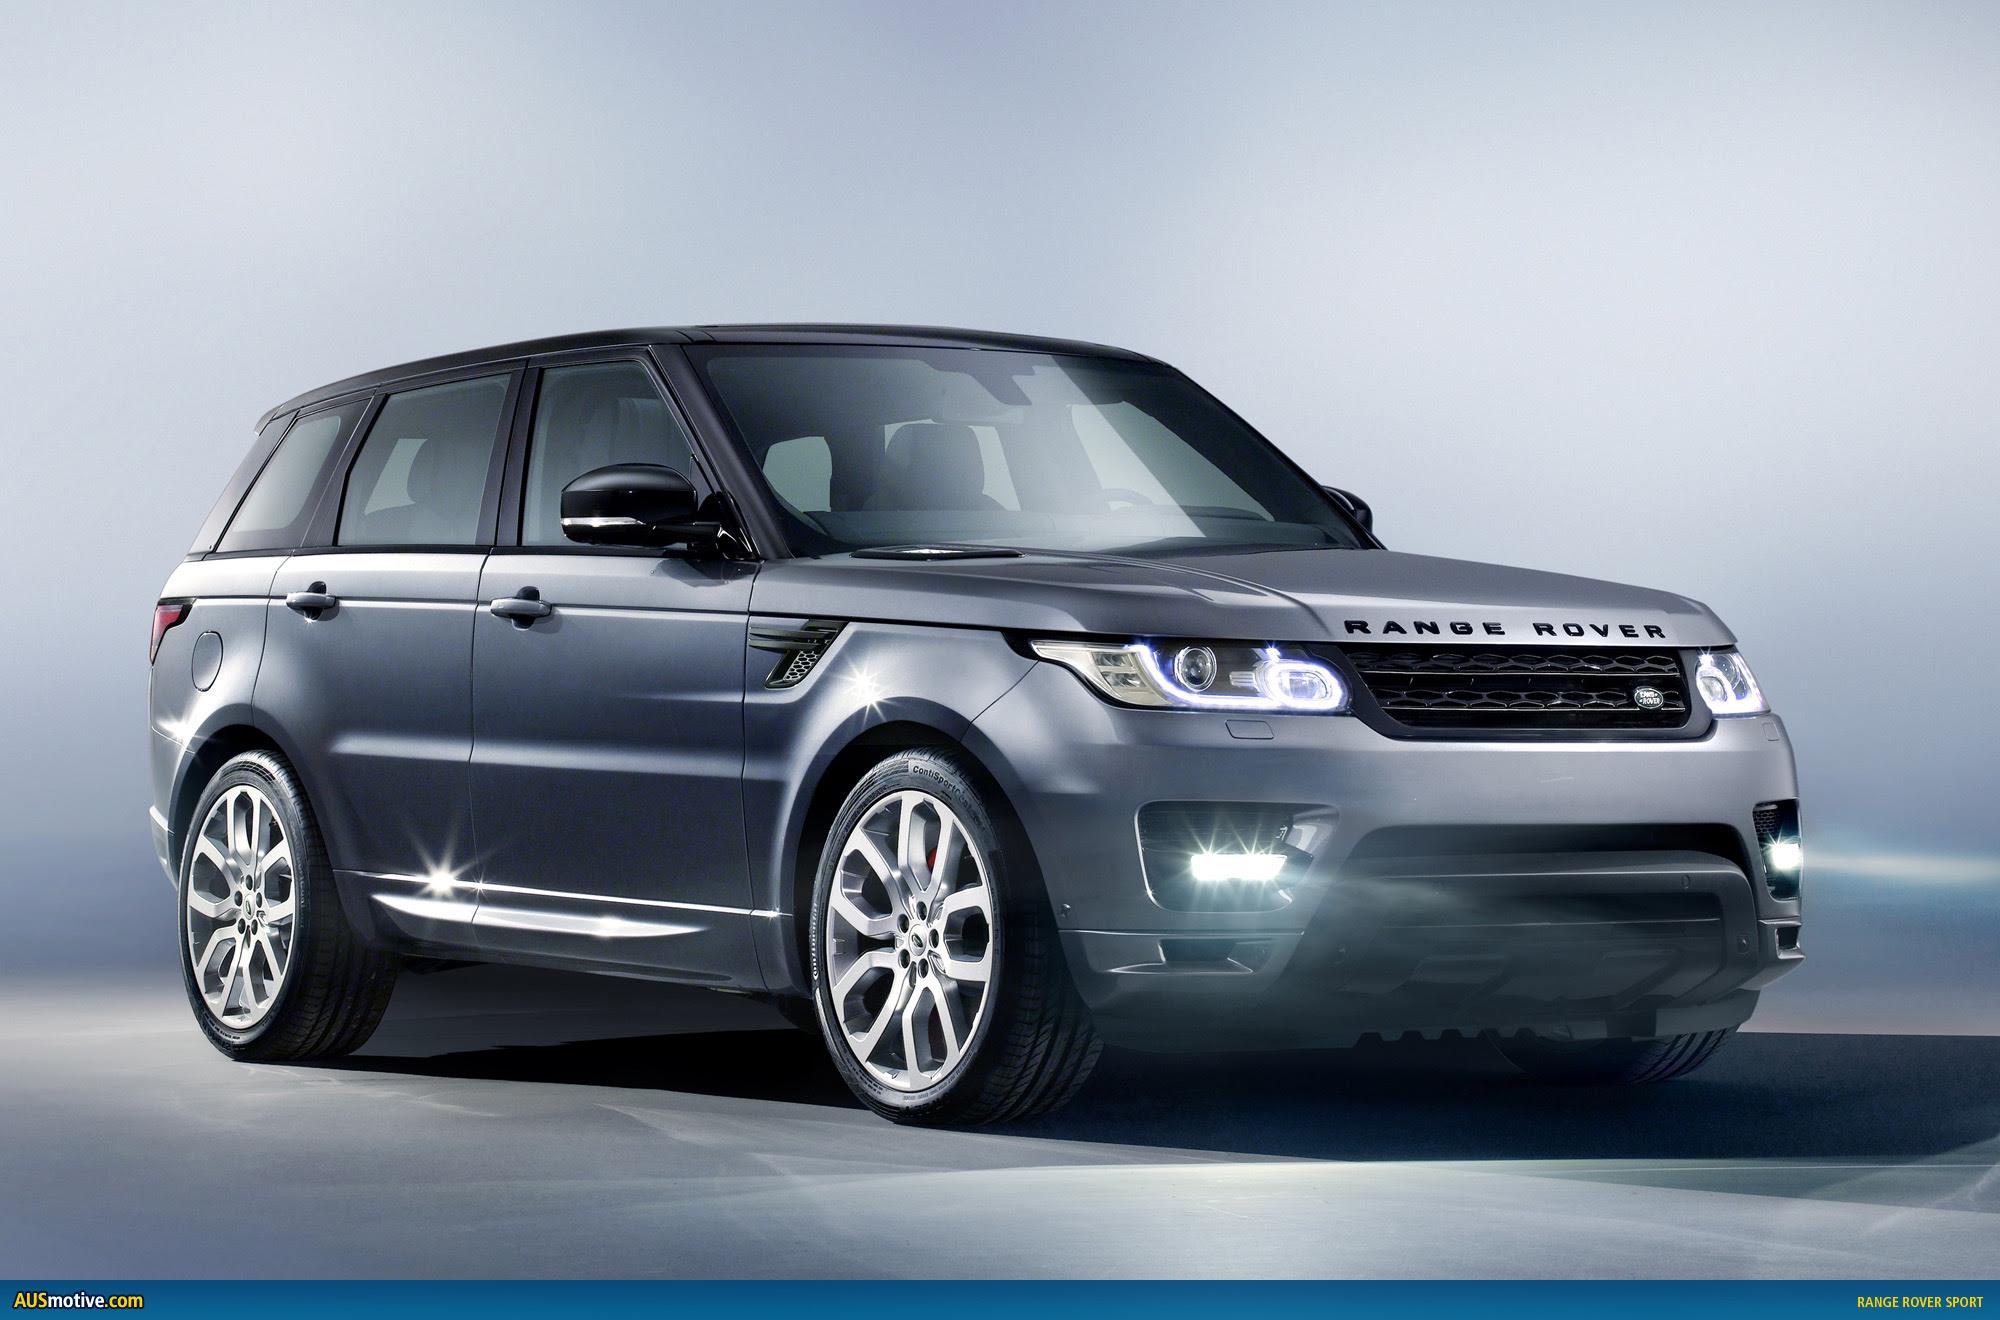 AUSmotive.com » New York 2013: Range Rover Sport revealed